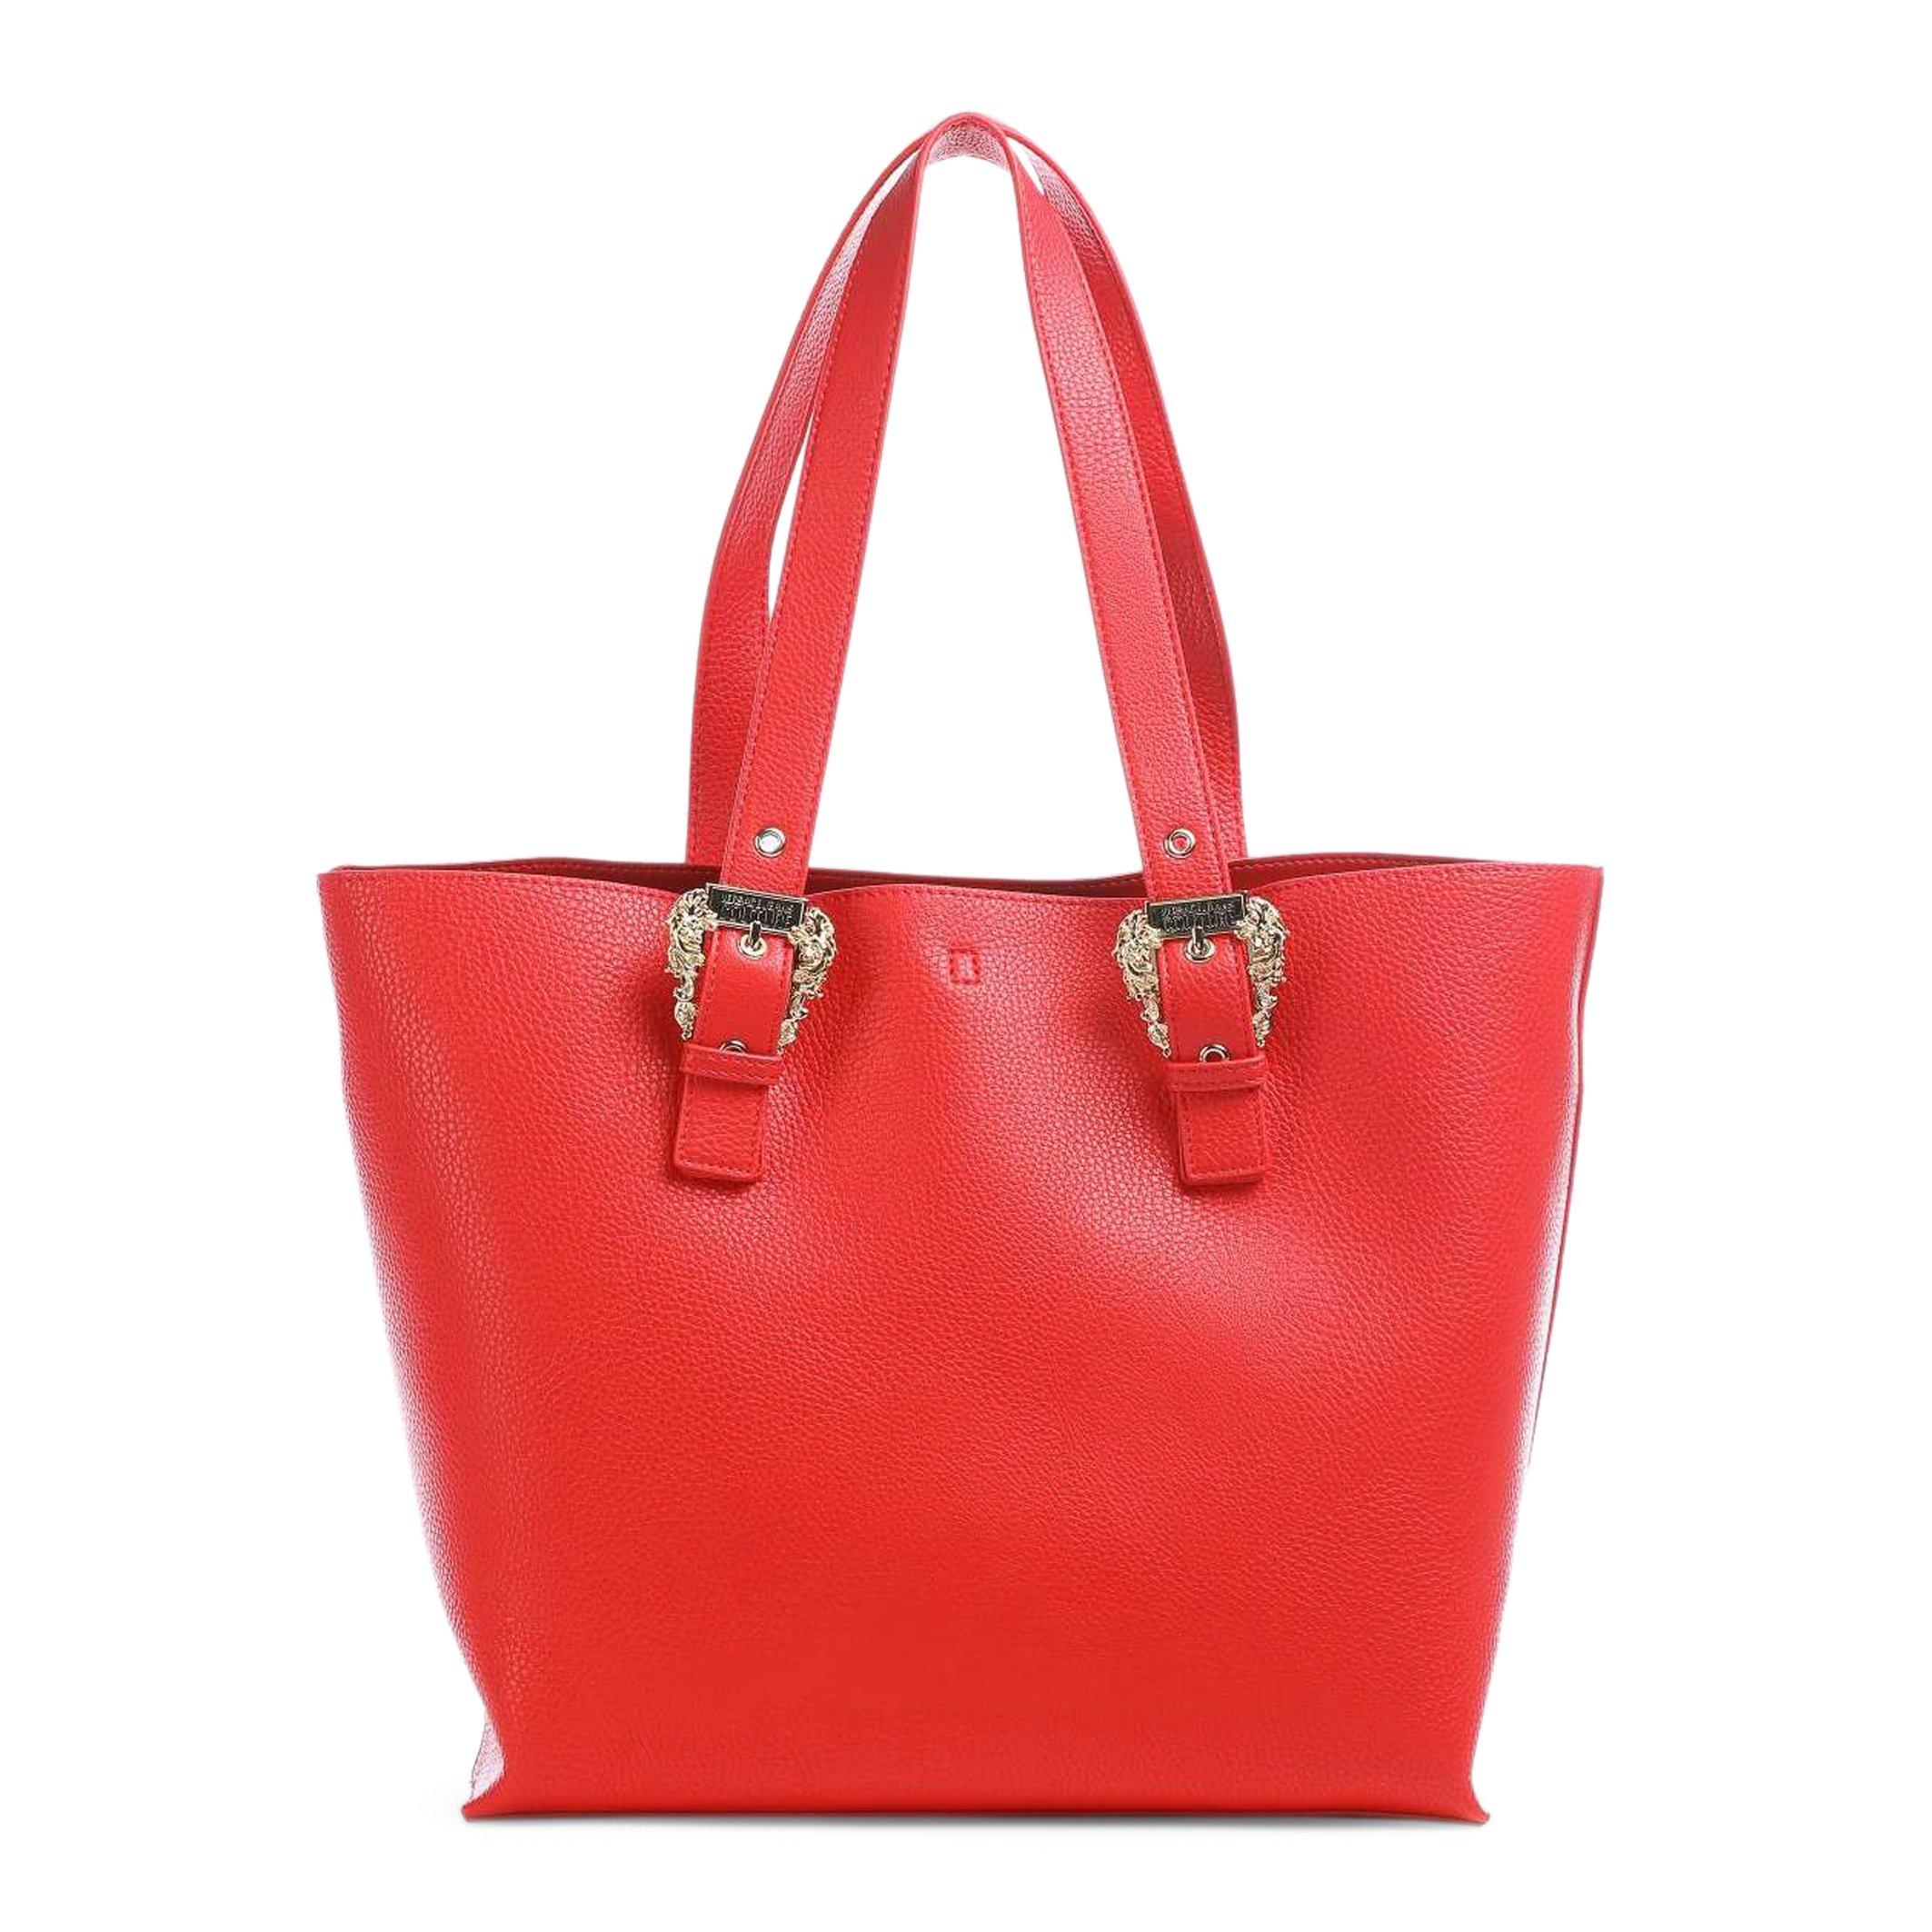 Versace Jeans Women's Shopping Bag Various Colours E1VWABF7_71578 - red NOSIZE